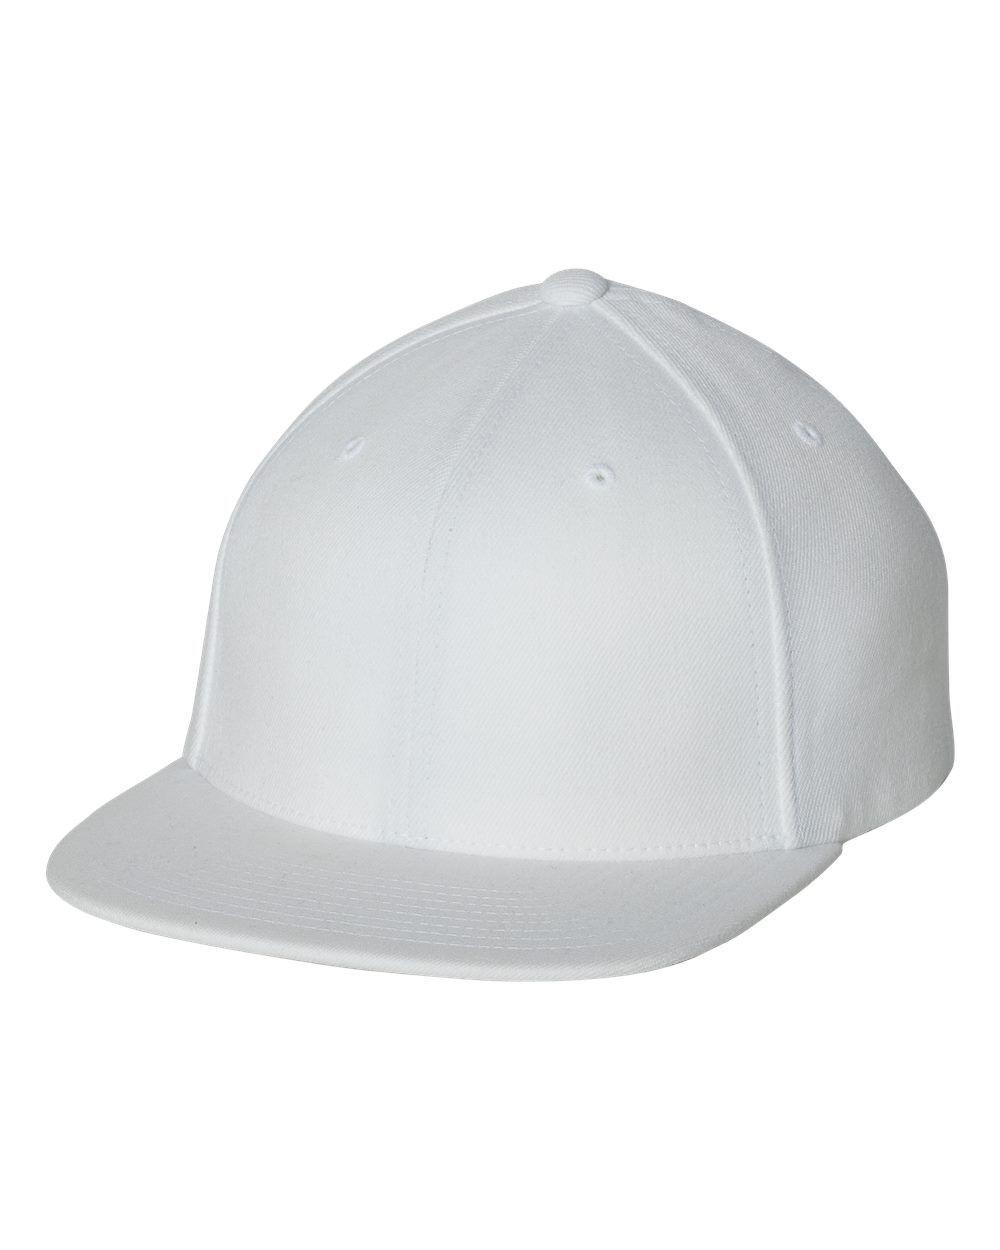 KATISN20W Camo Ladies Pink Women/'s Hunting Hat Baseball Cap